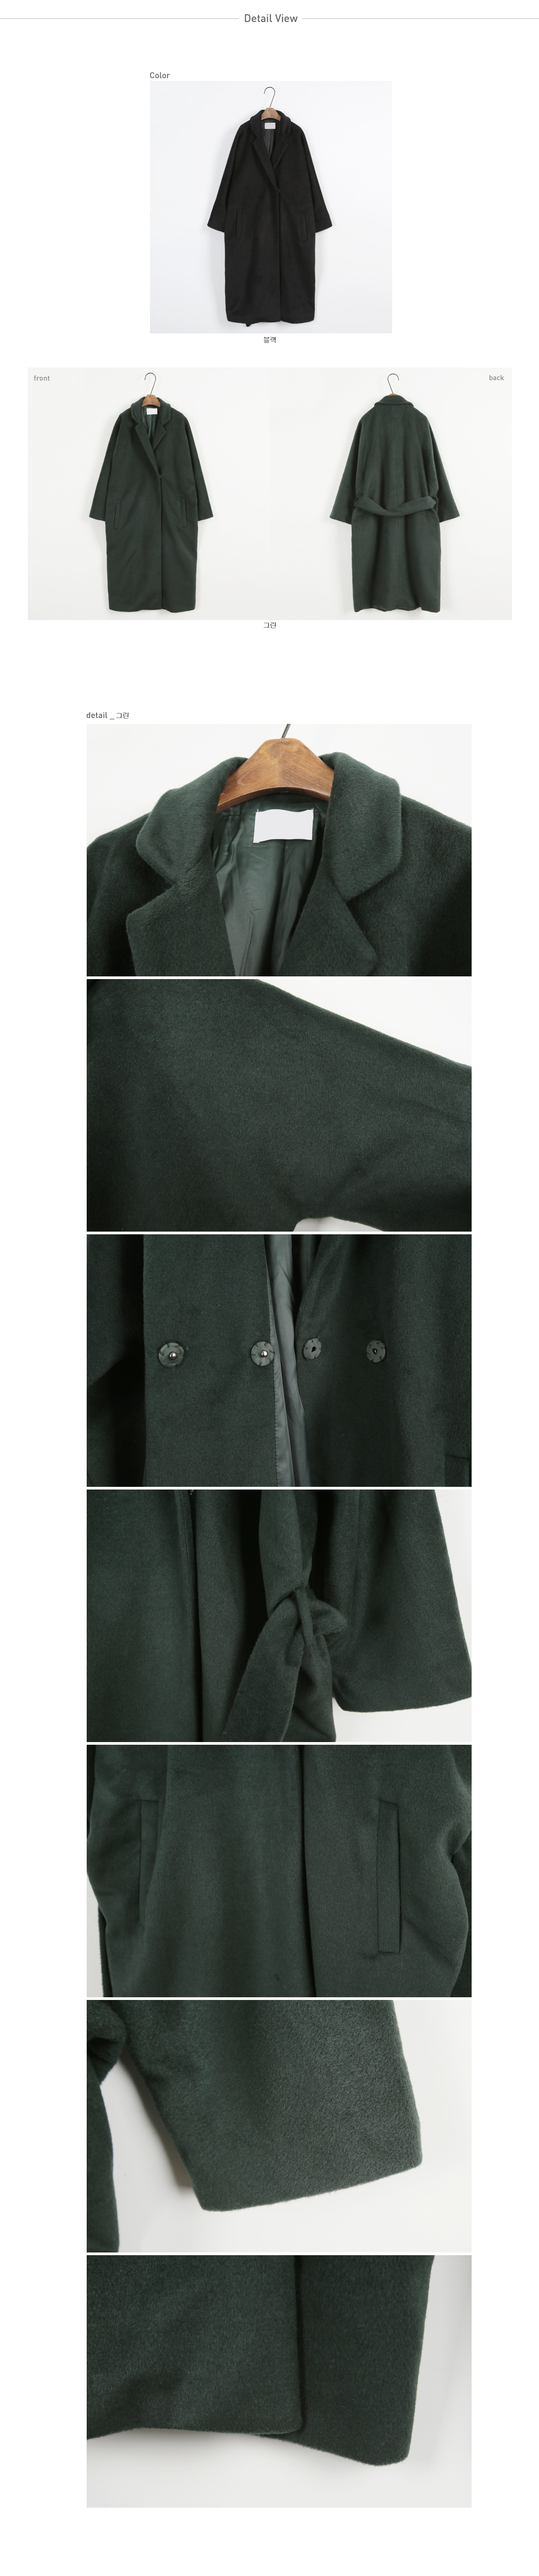 Earl Coat - Wool 30%